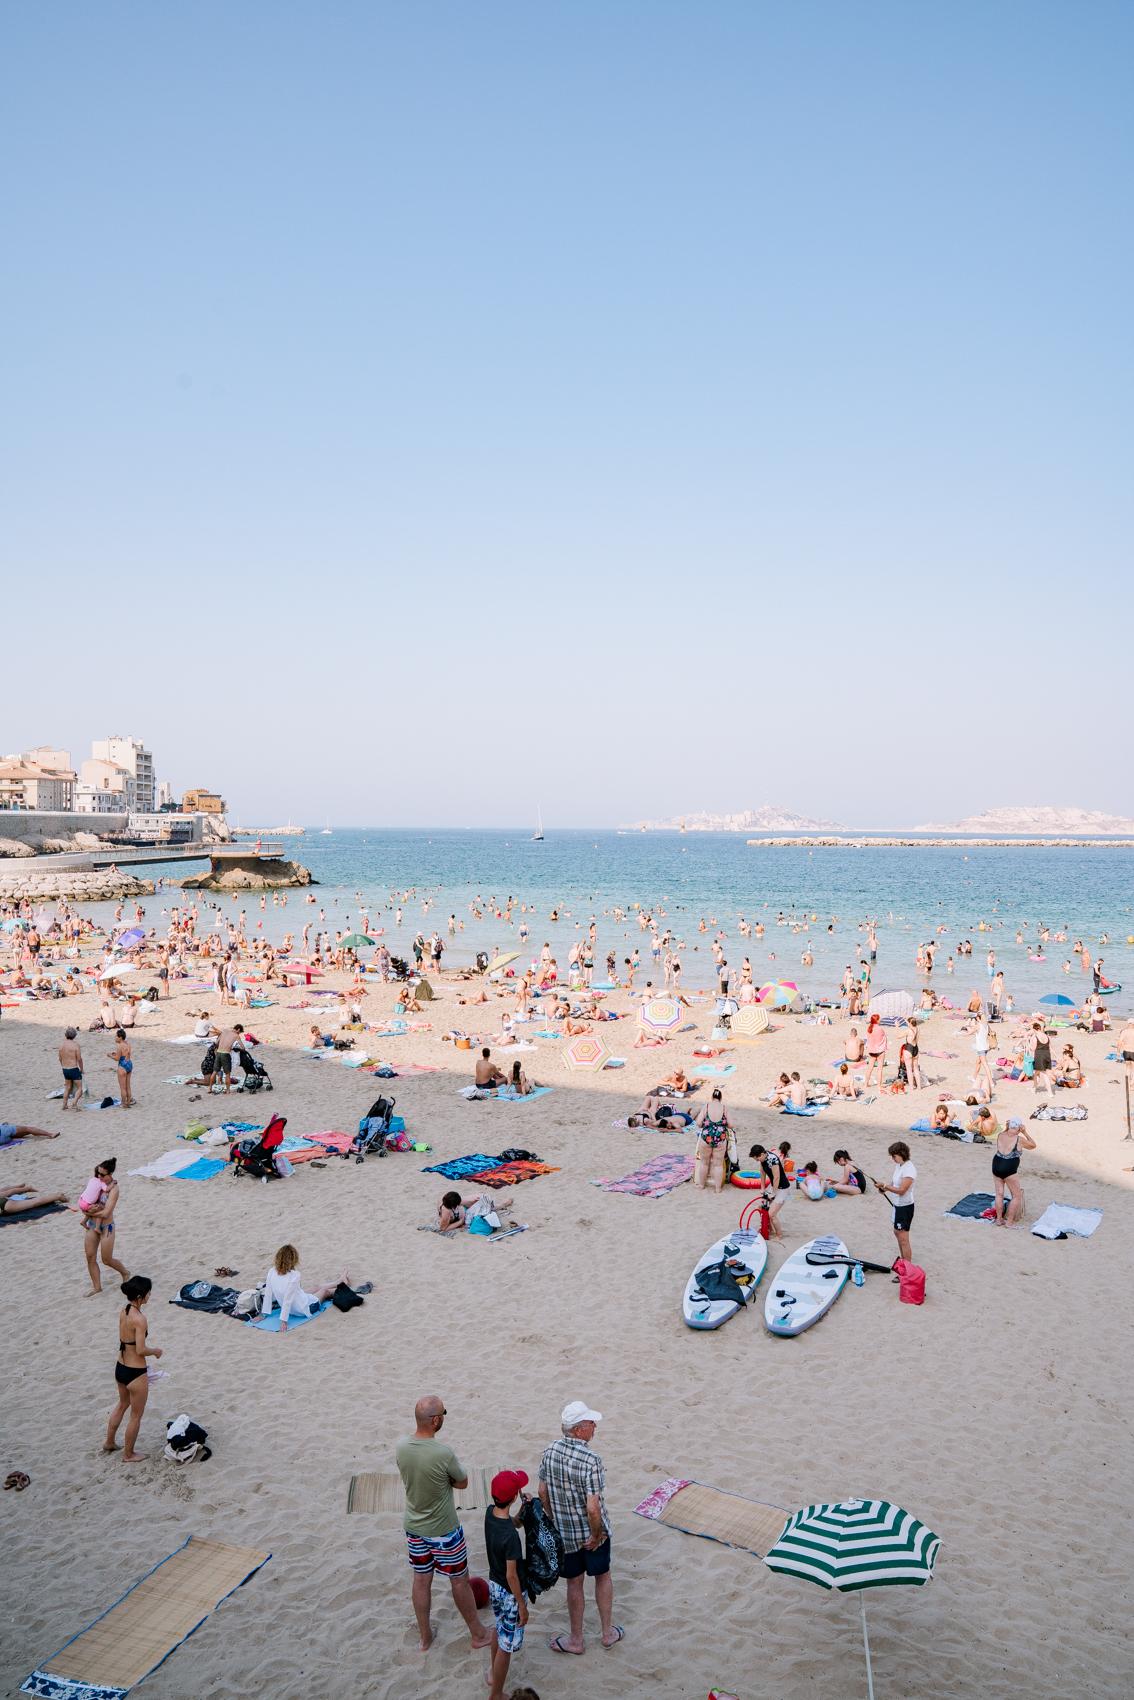 TRAVEL-Photography-provence-beach-Marseille-Clara-Tuma.jpg